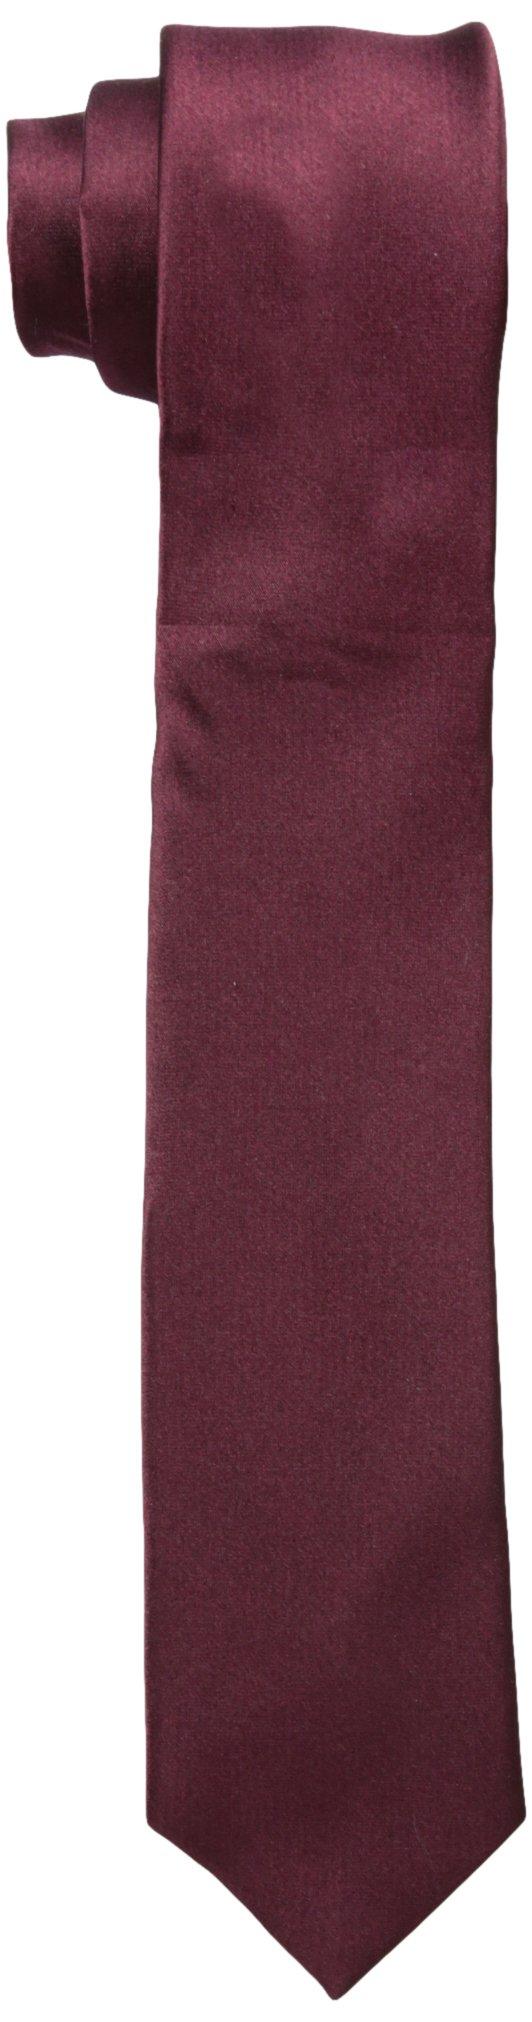 Original Penguin Men's Solid Satin Super Slim Tie, Burgundy, One Size